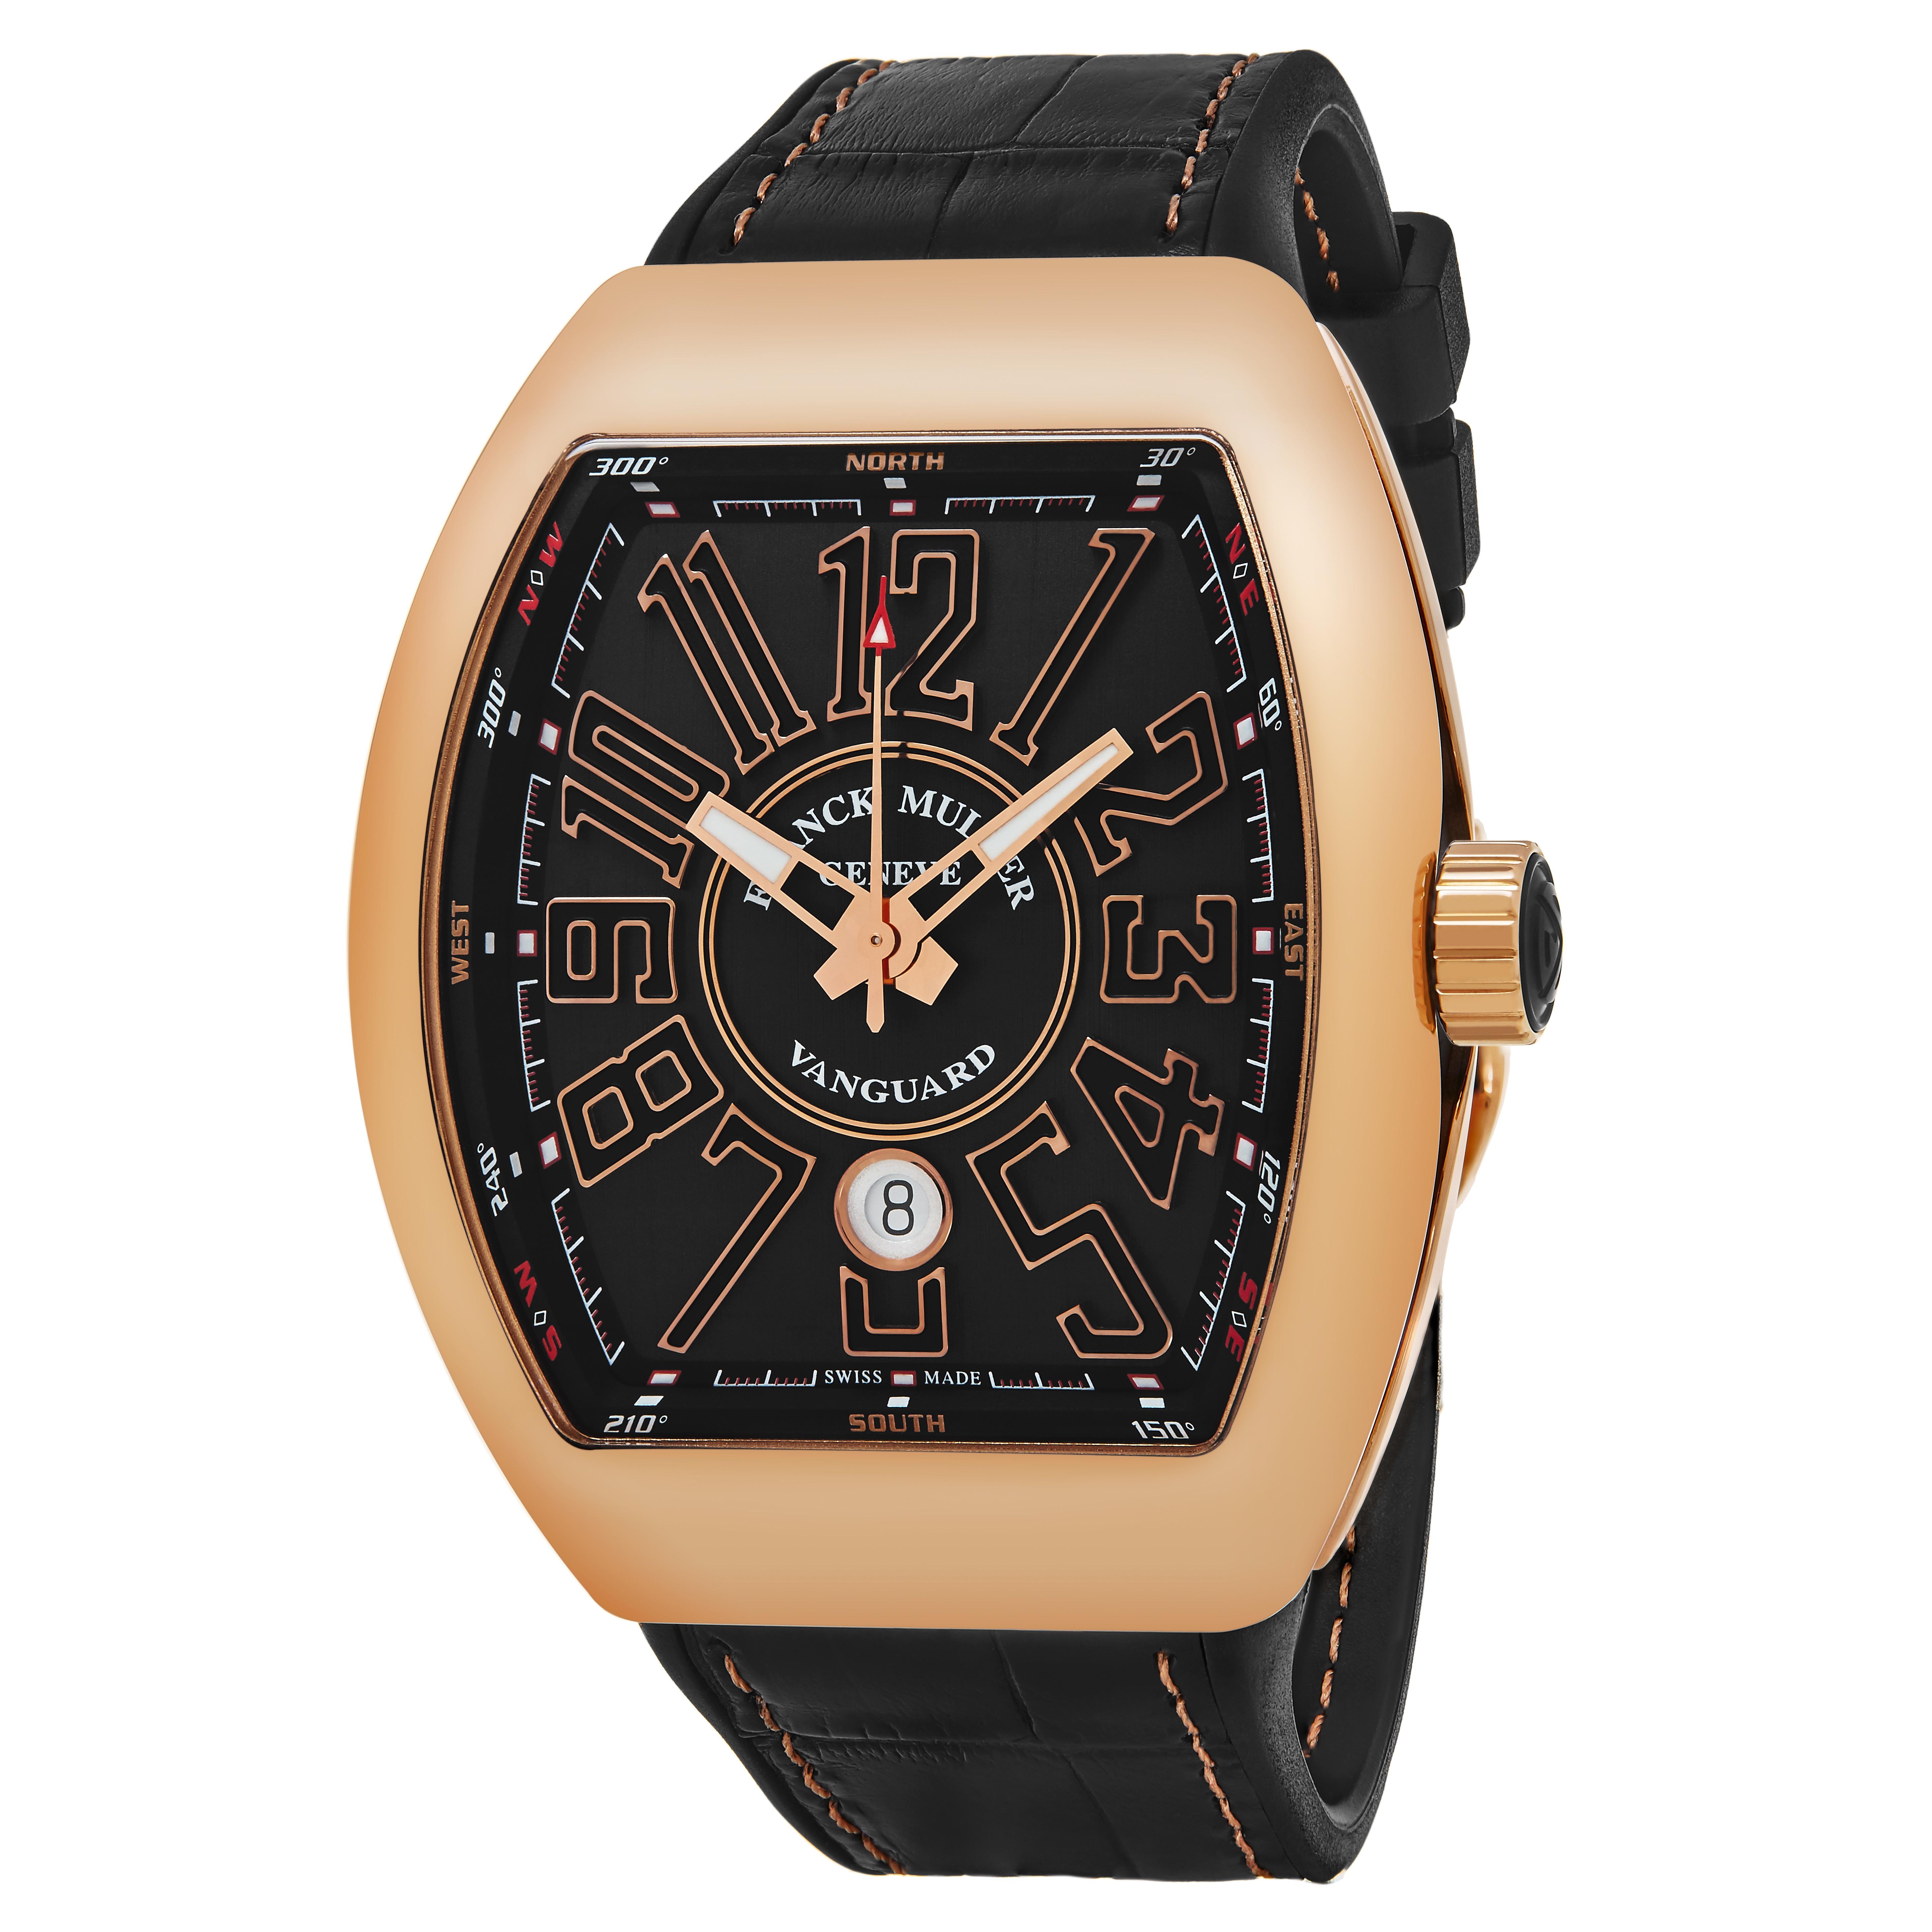 """""Franck Muller Vanguard 45Scgldbrngld Watch"""""" 858370"